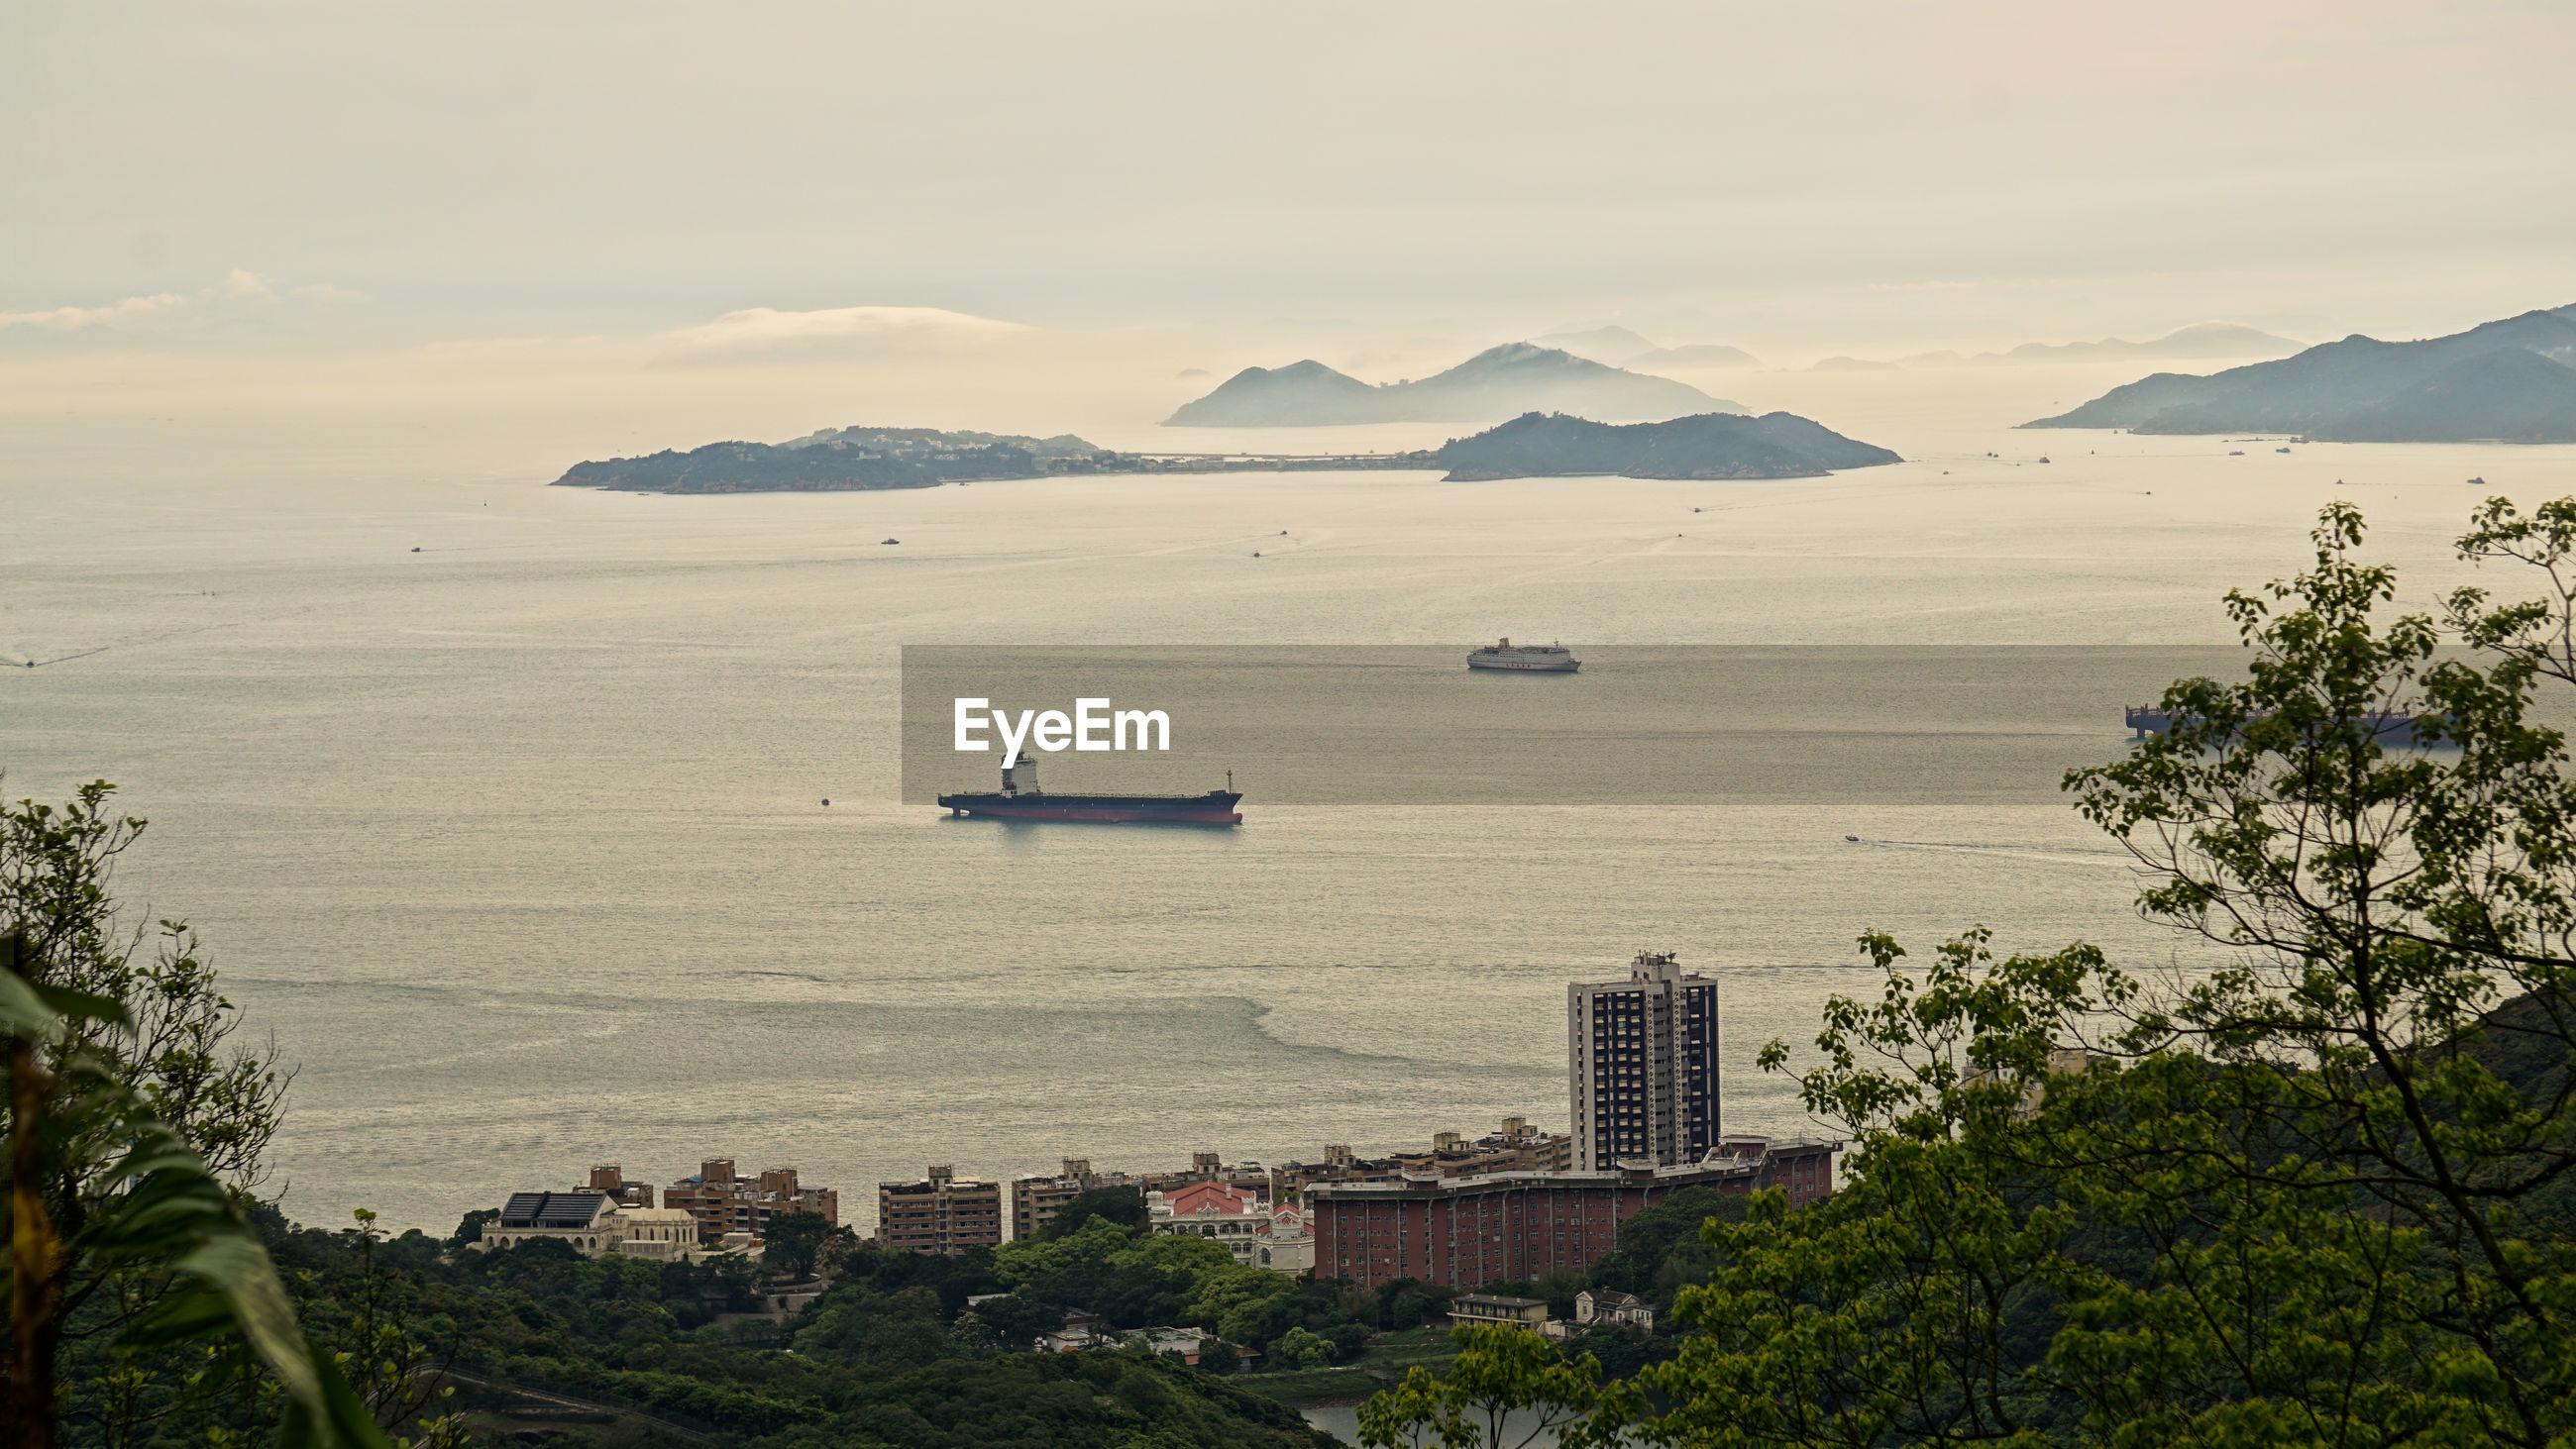 HIGH ANGLE VIEW OF CITY AND SEA